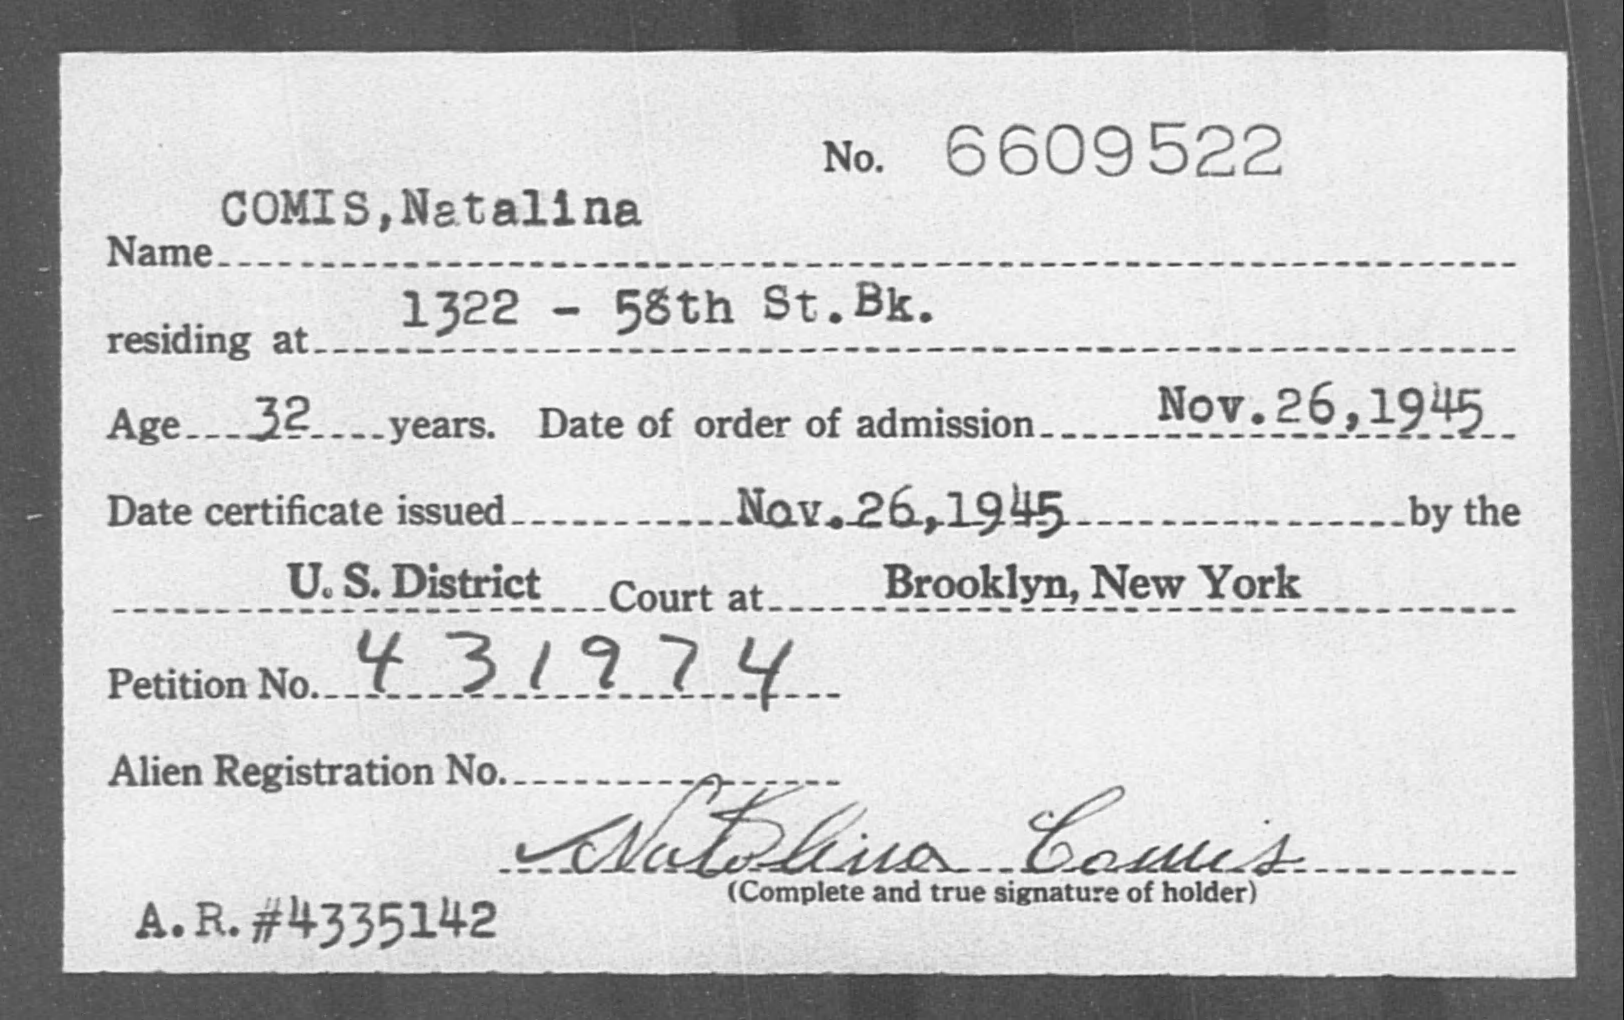 COMIS, Natalina - Born: [BLANK], Naturalized: 1945